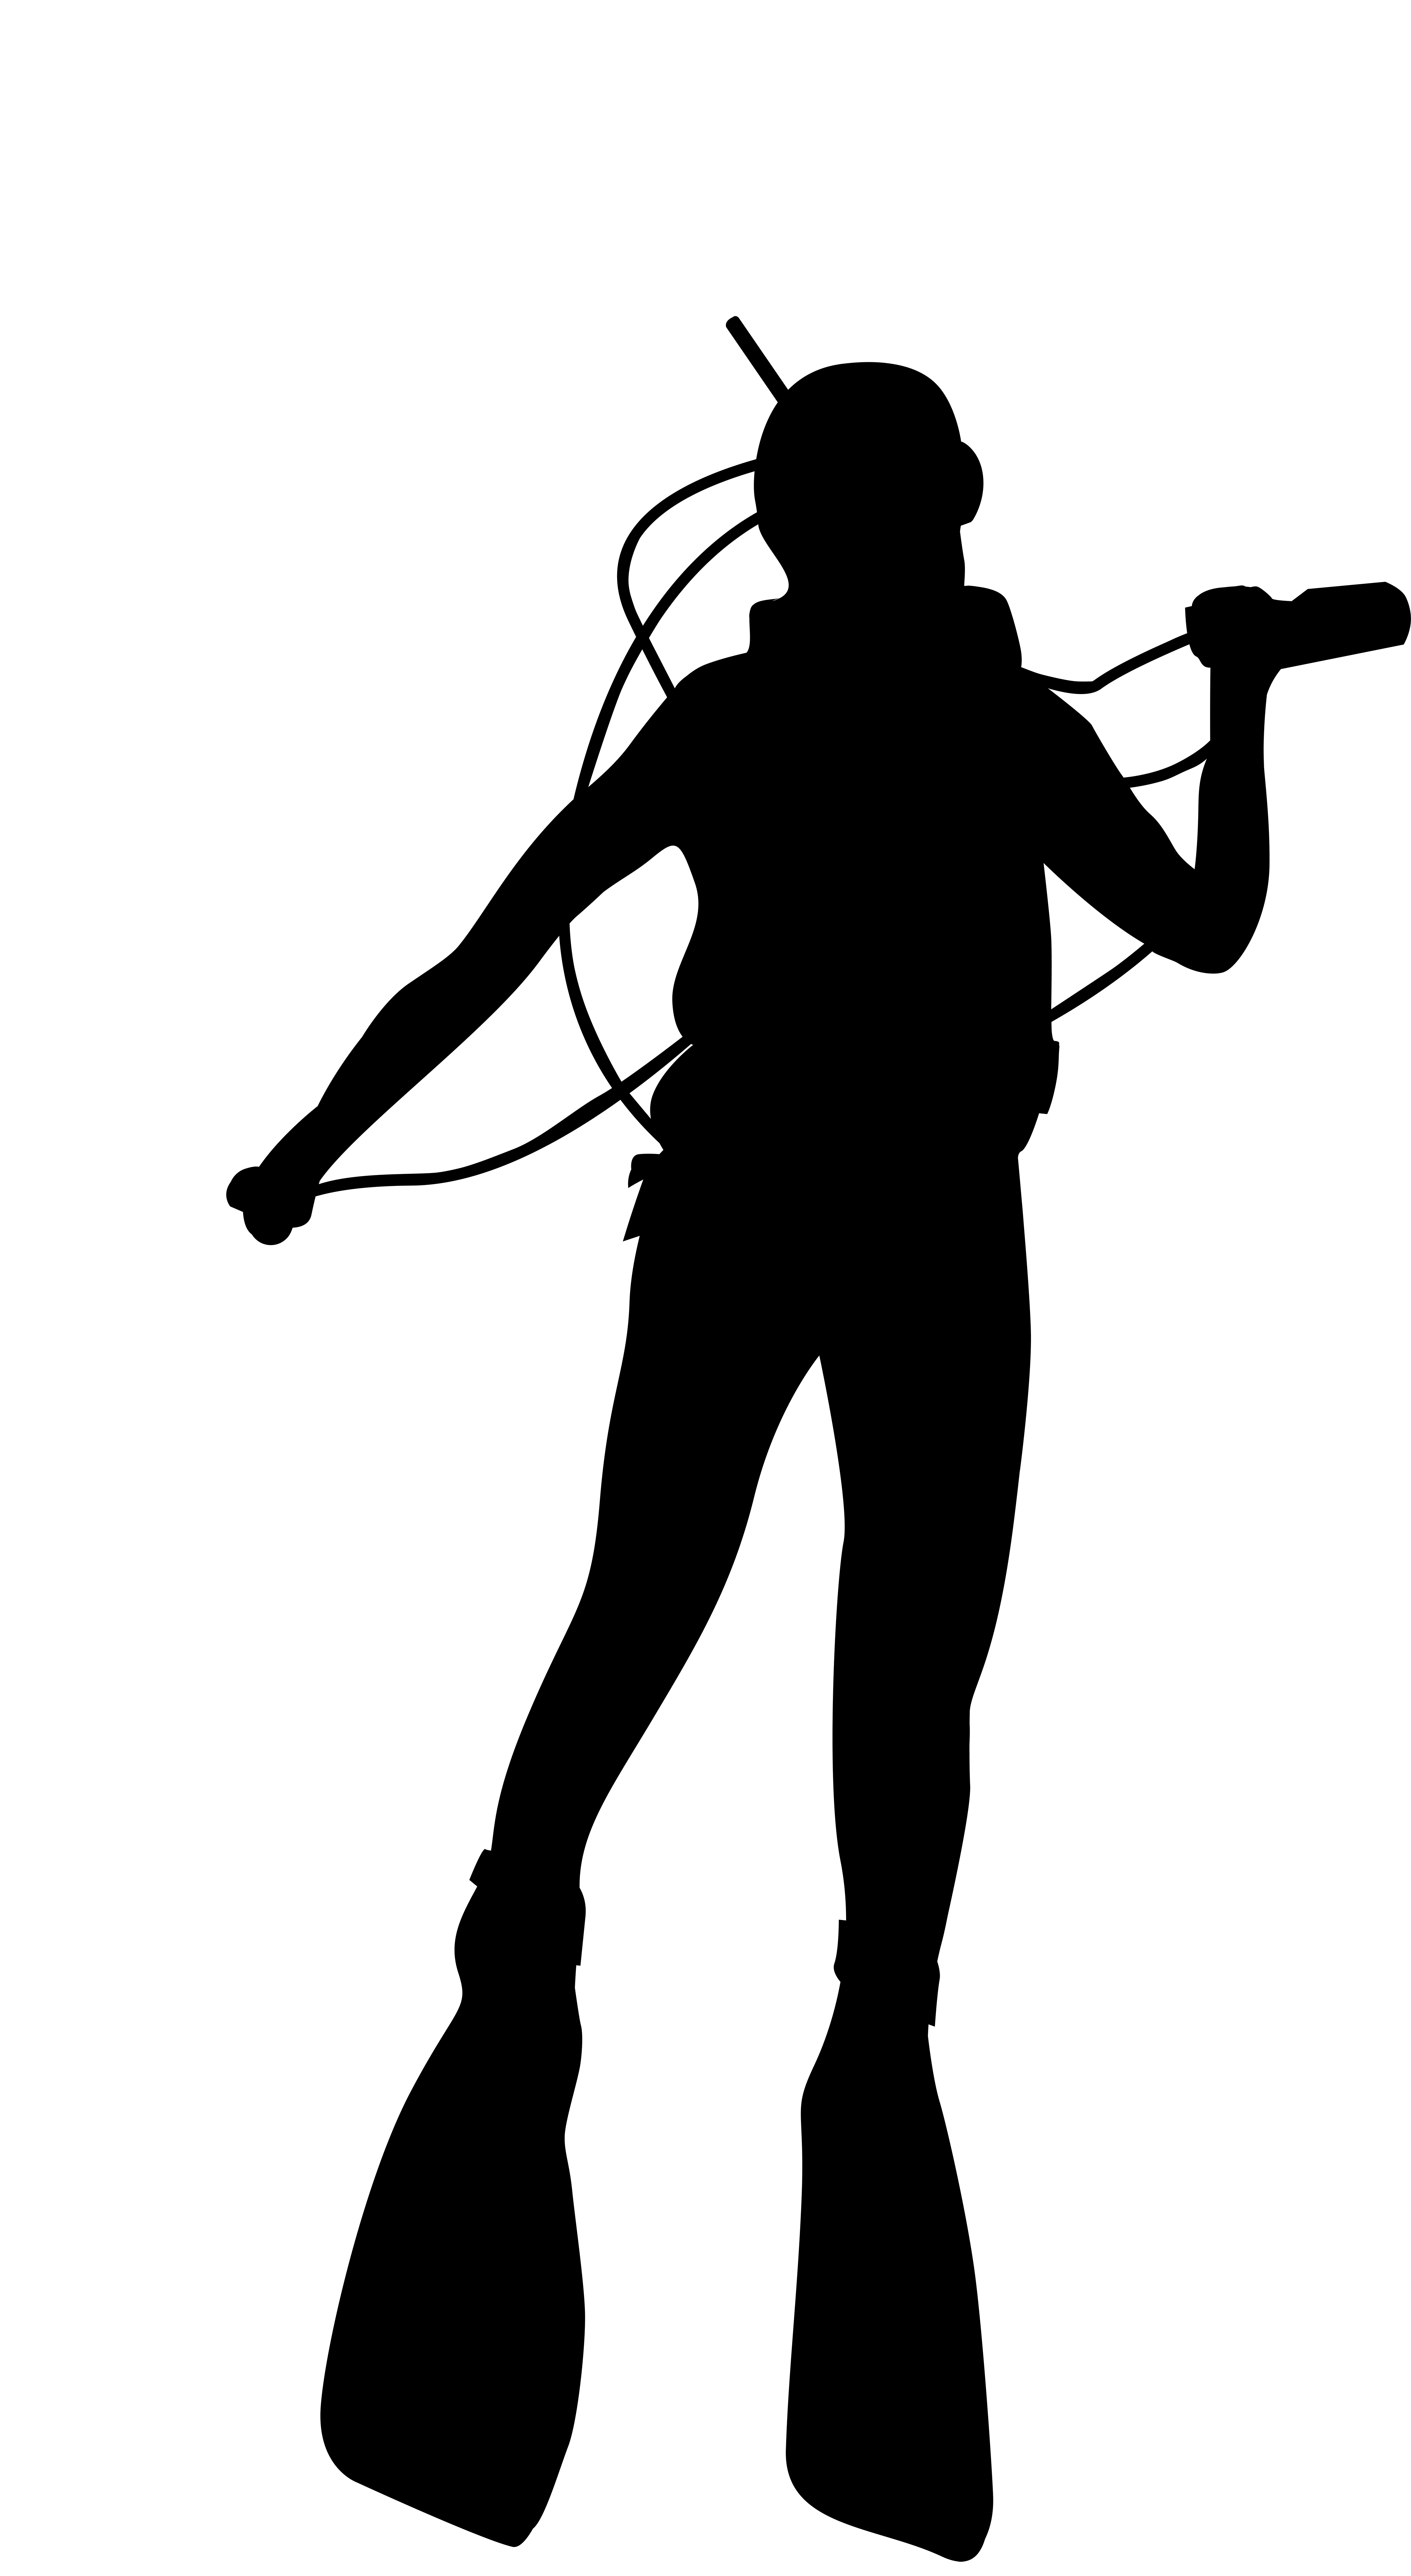 4381x8000 Silhouette Underwater Diving Scuba Diving Clip Art